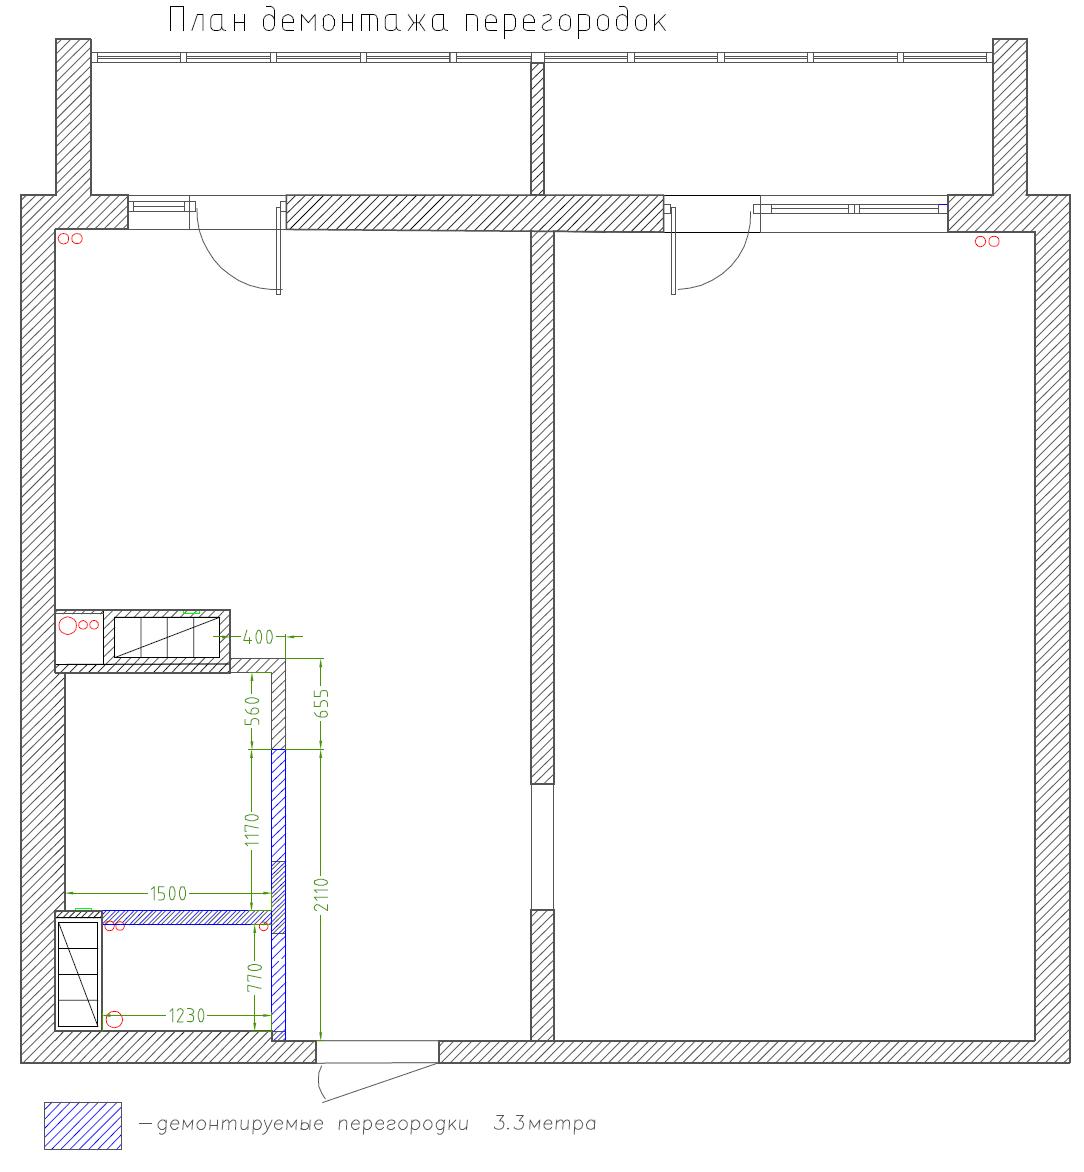 план демонтажа стен и перегородок в квартире